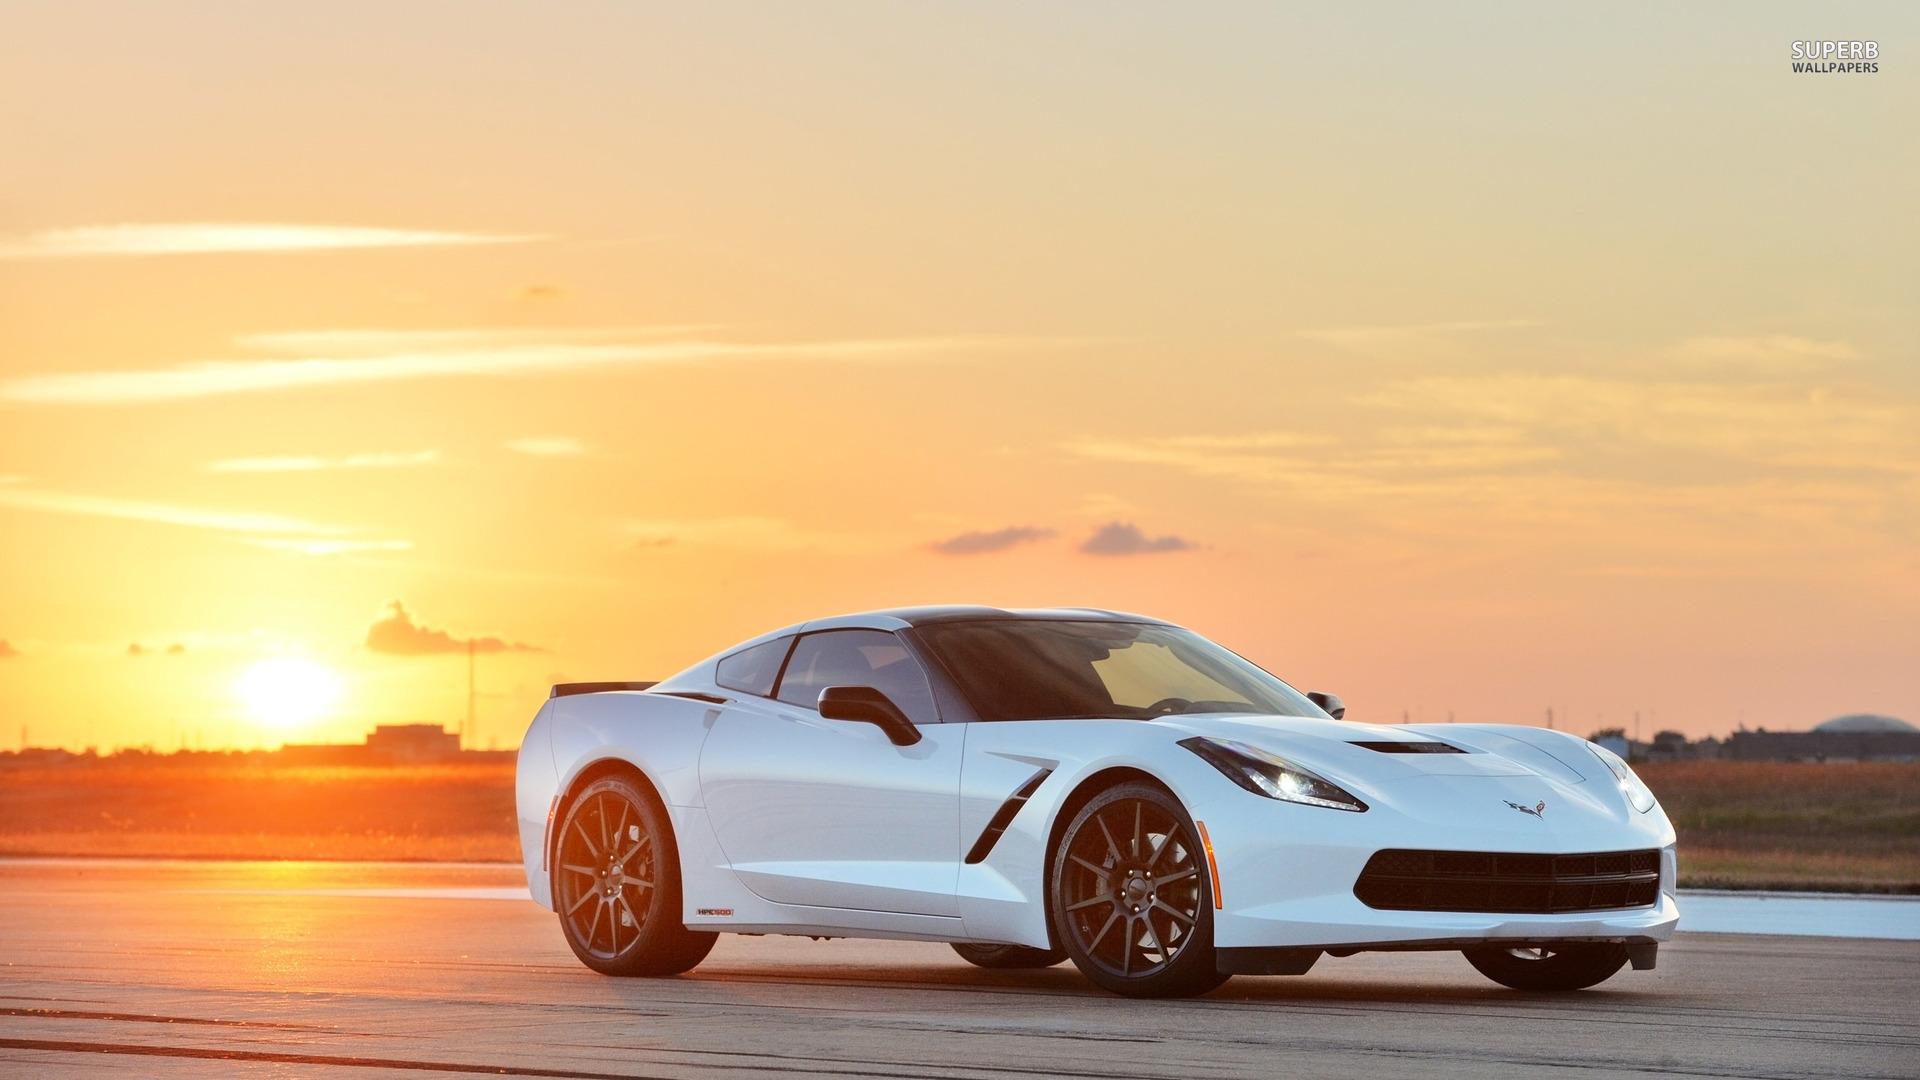 GT5 2014 Corvette Stingray C7 Wallpaper 19201080 Engine 1920x1080